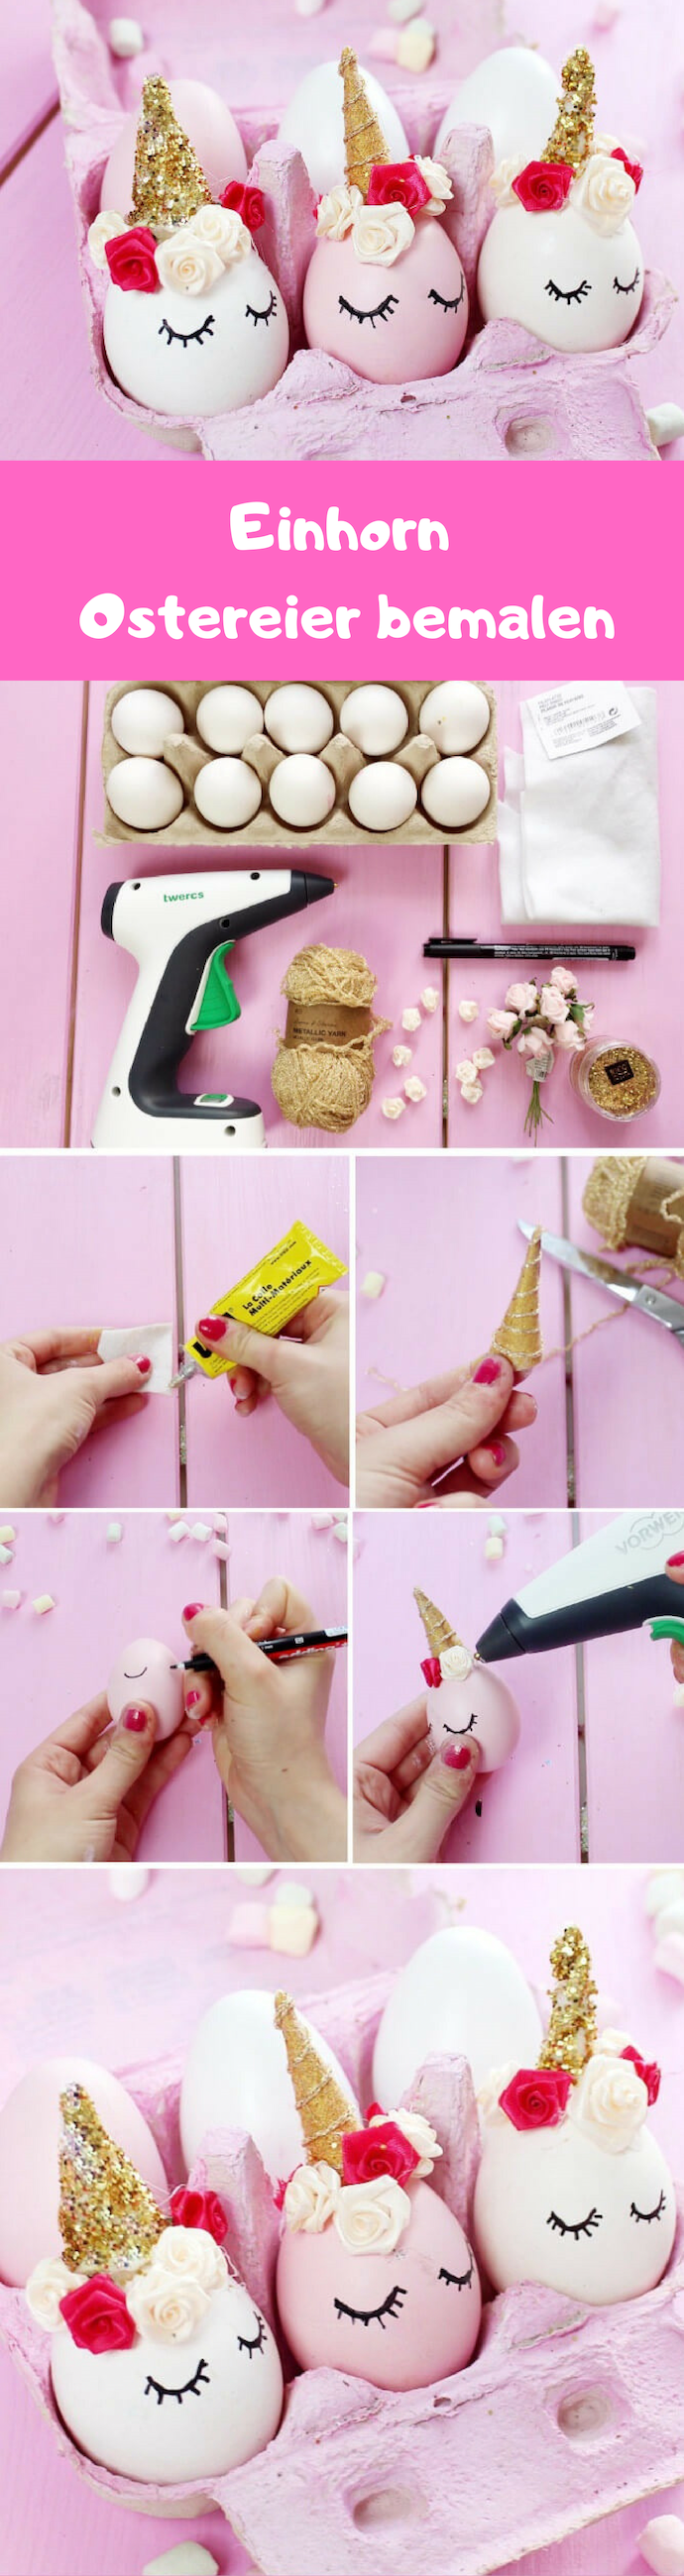 Ostereier bemalen wie ein Einhorn - DIY Anleitung